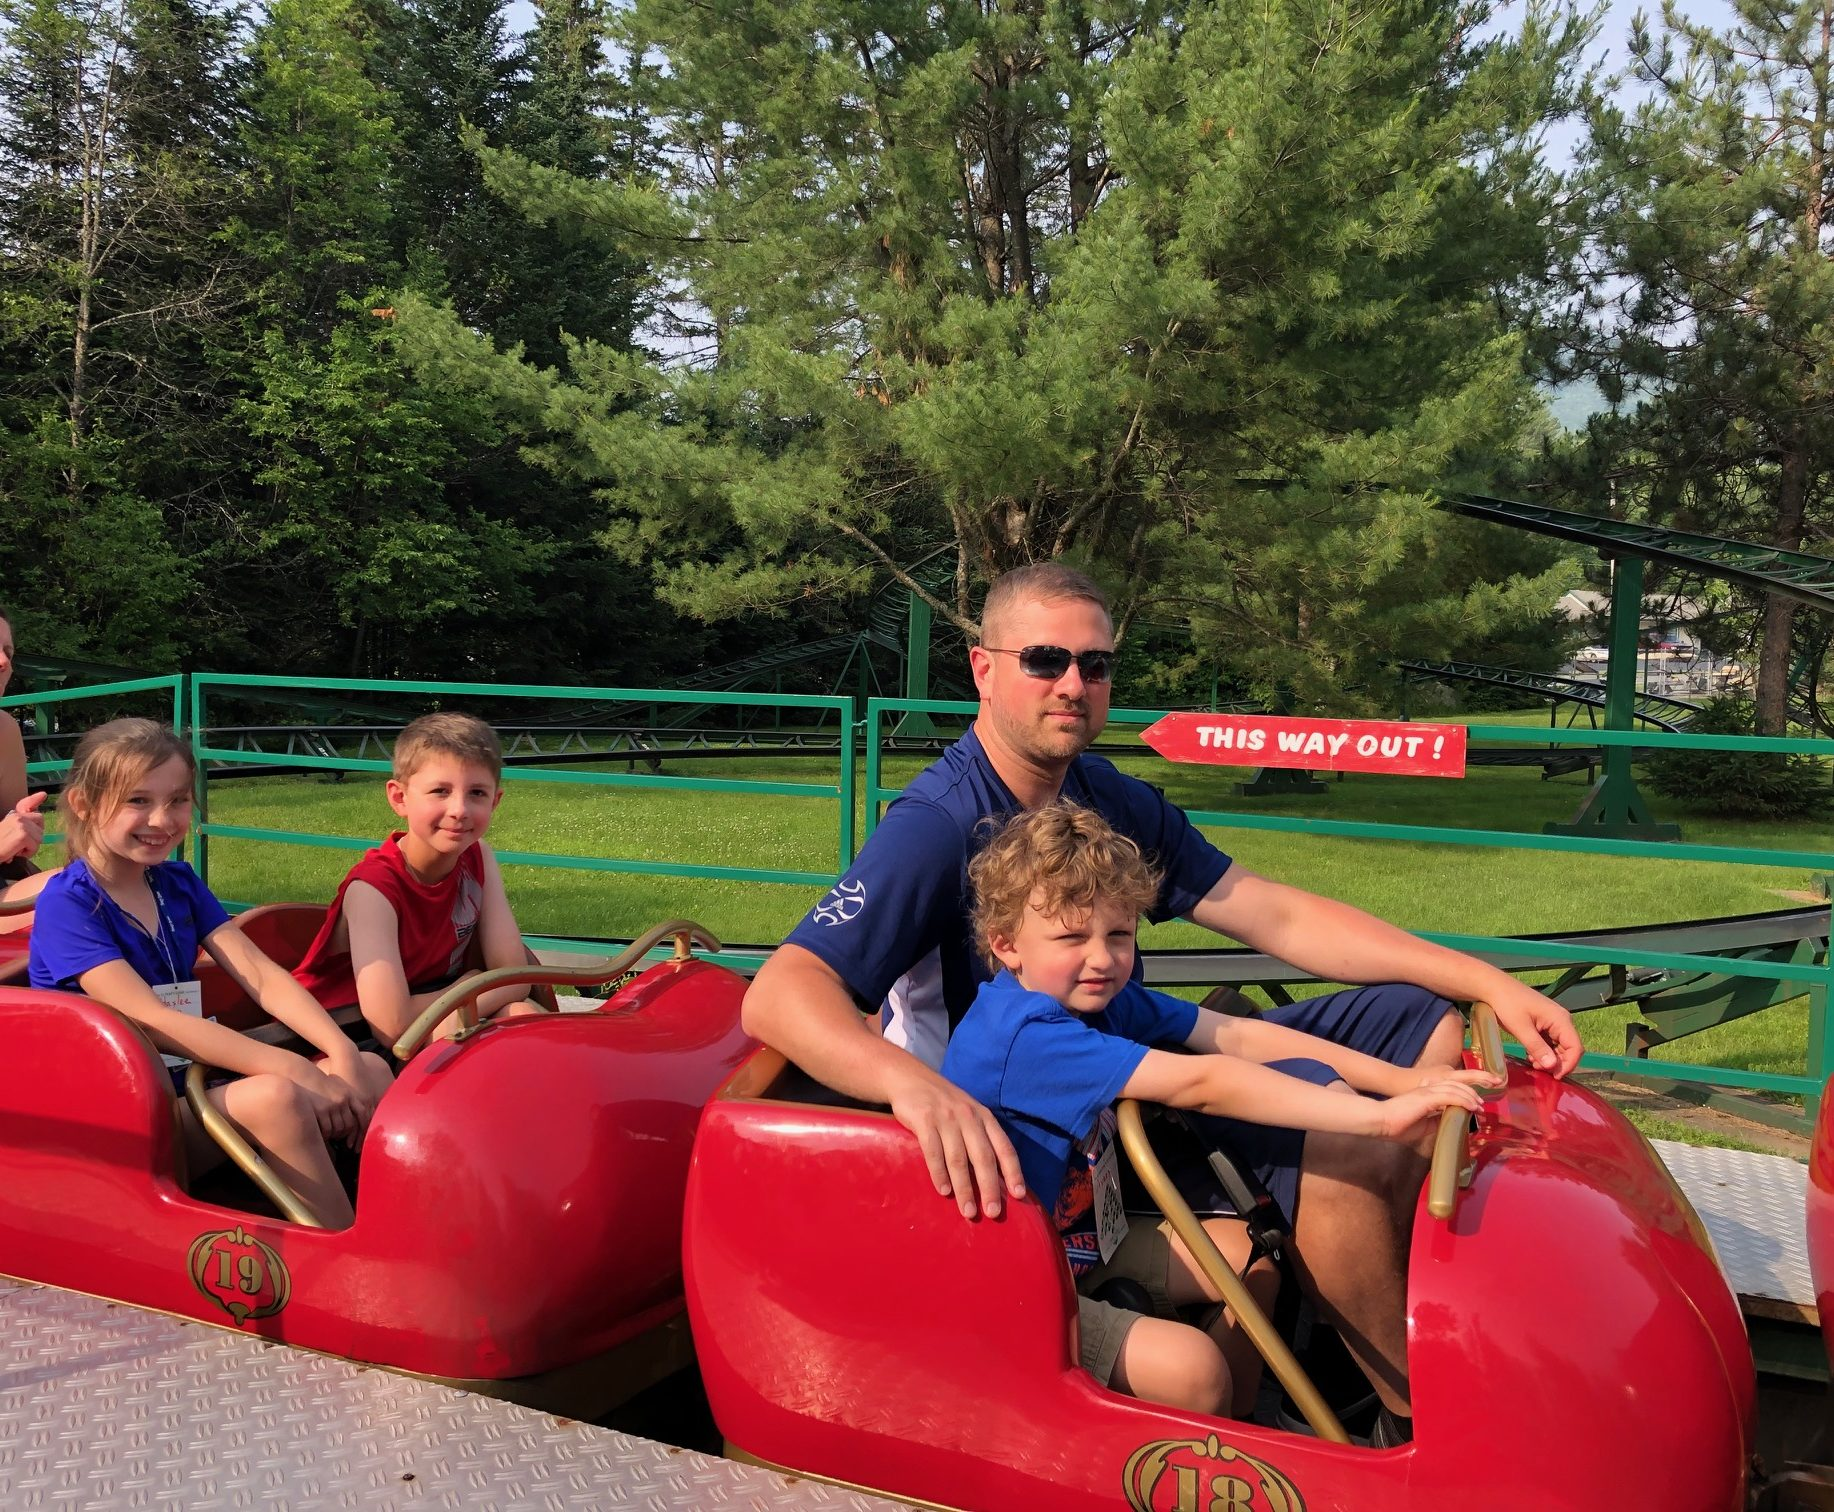 Rudy's Rapid Transit Coaster